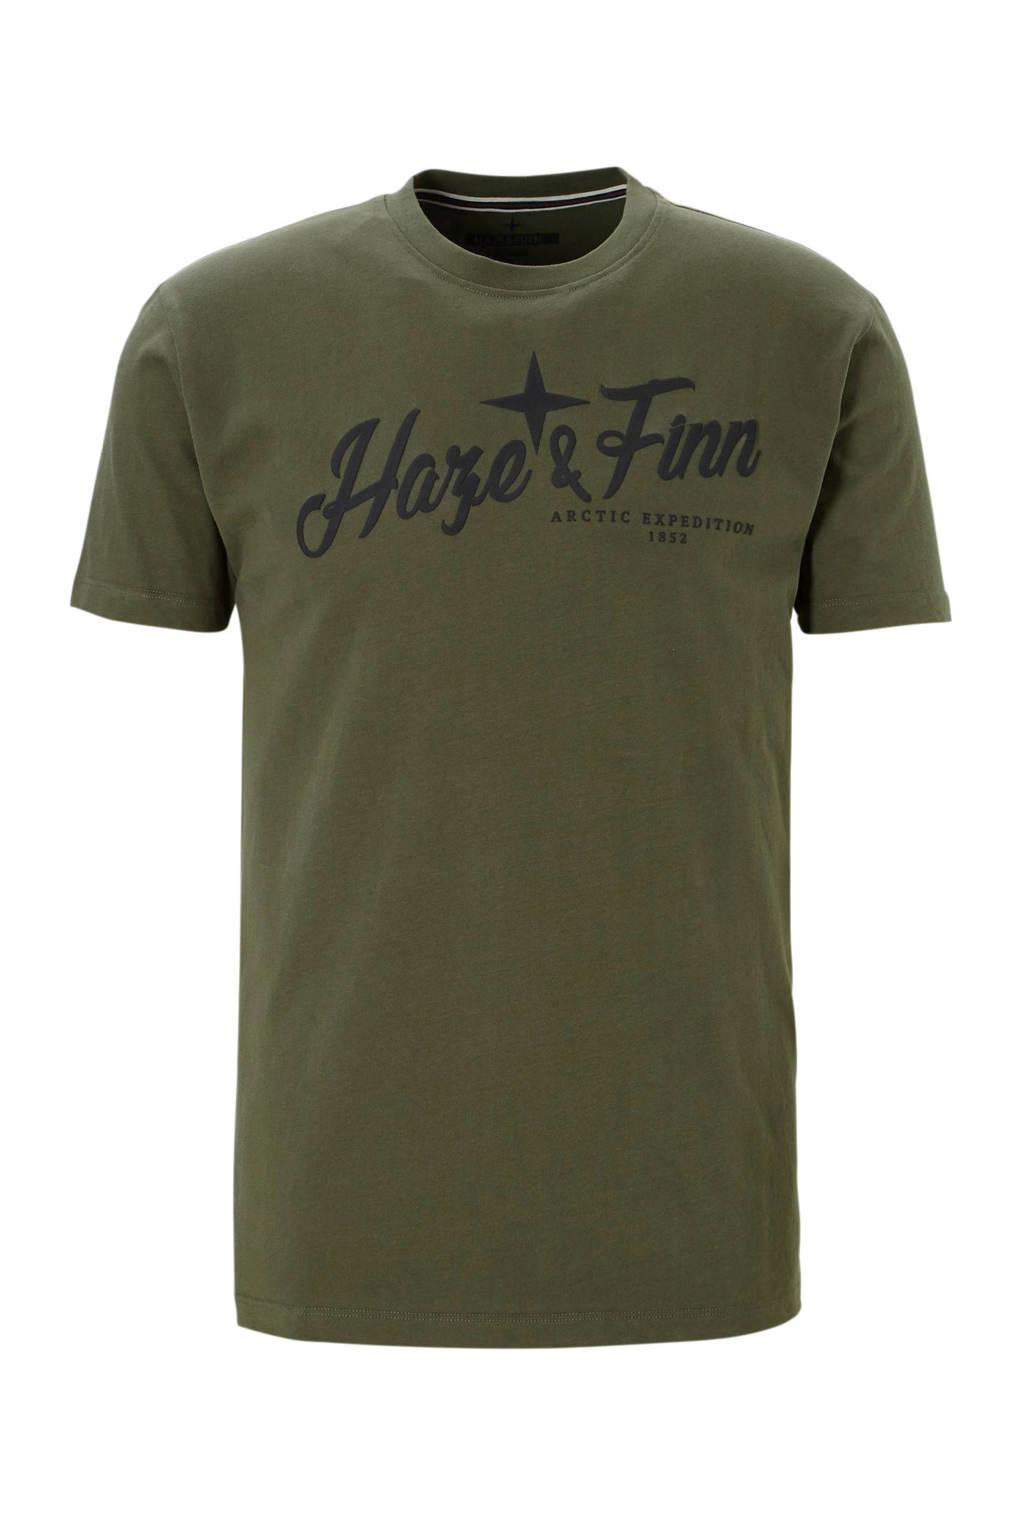 Haze & Finn t-shirt, Kaki